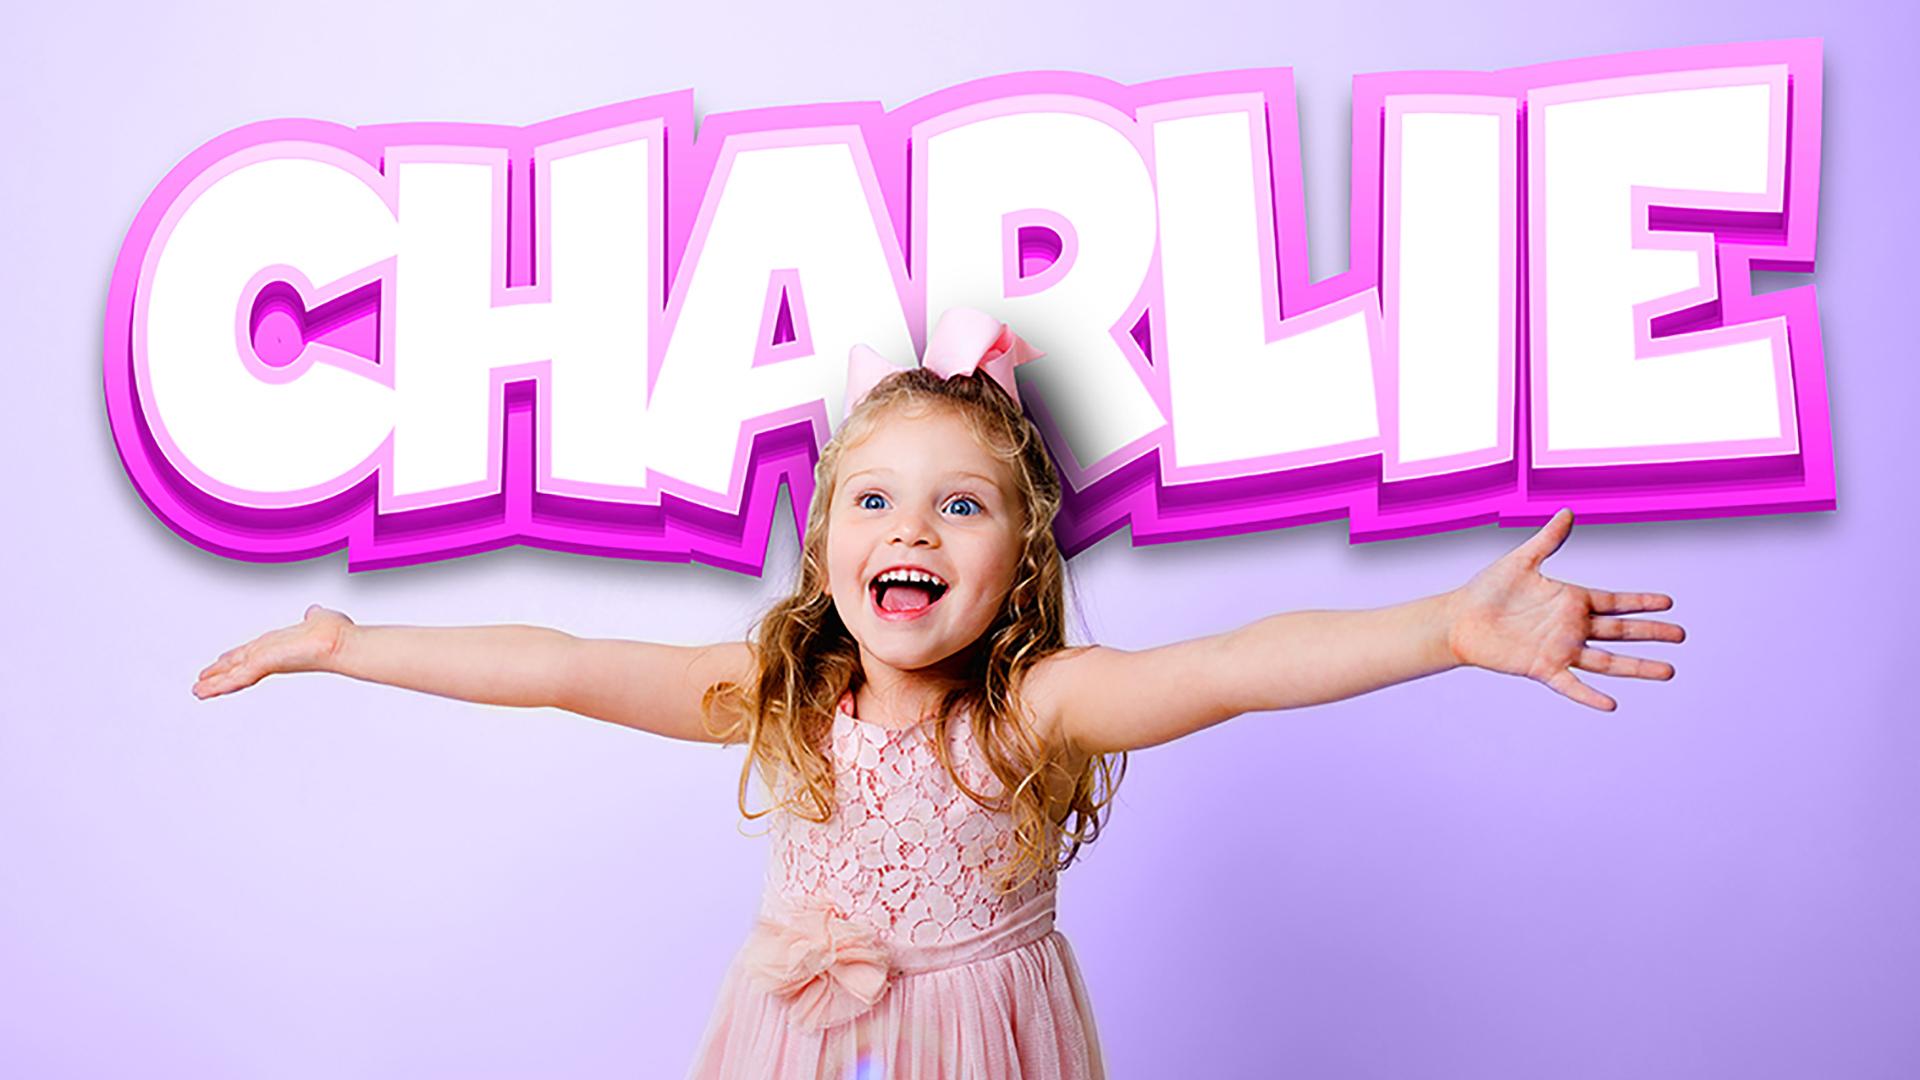 Charlie - Season 3